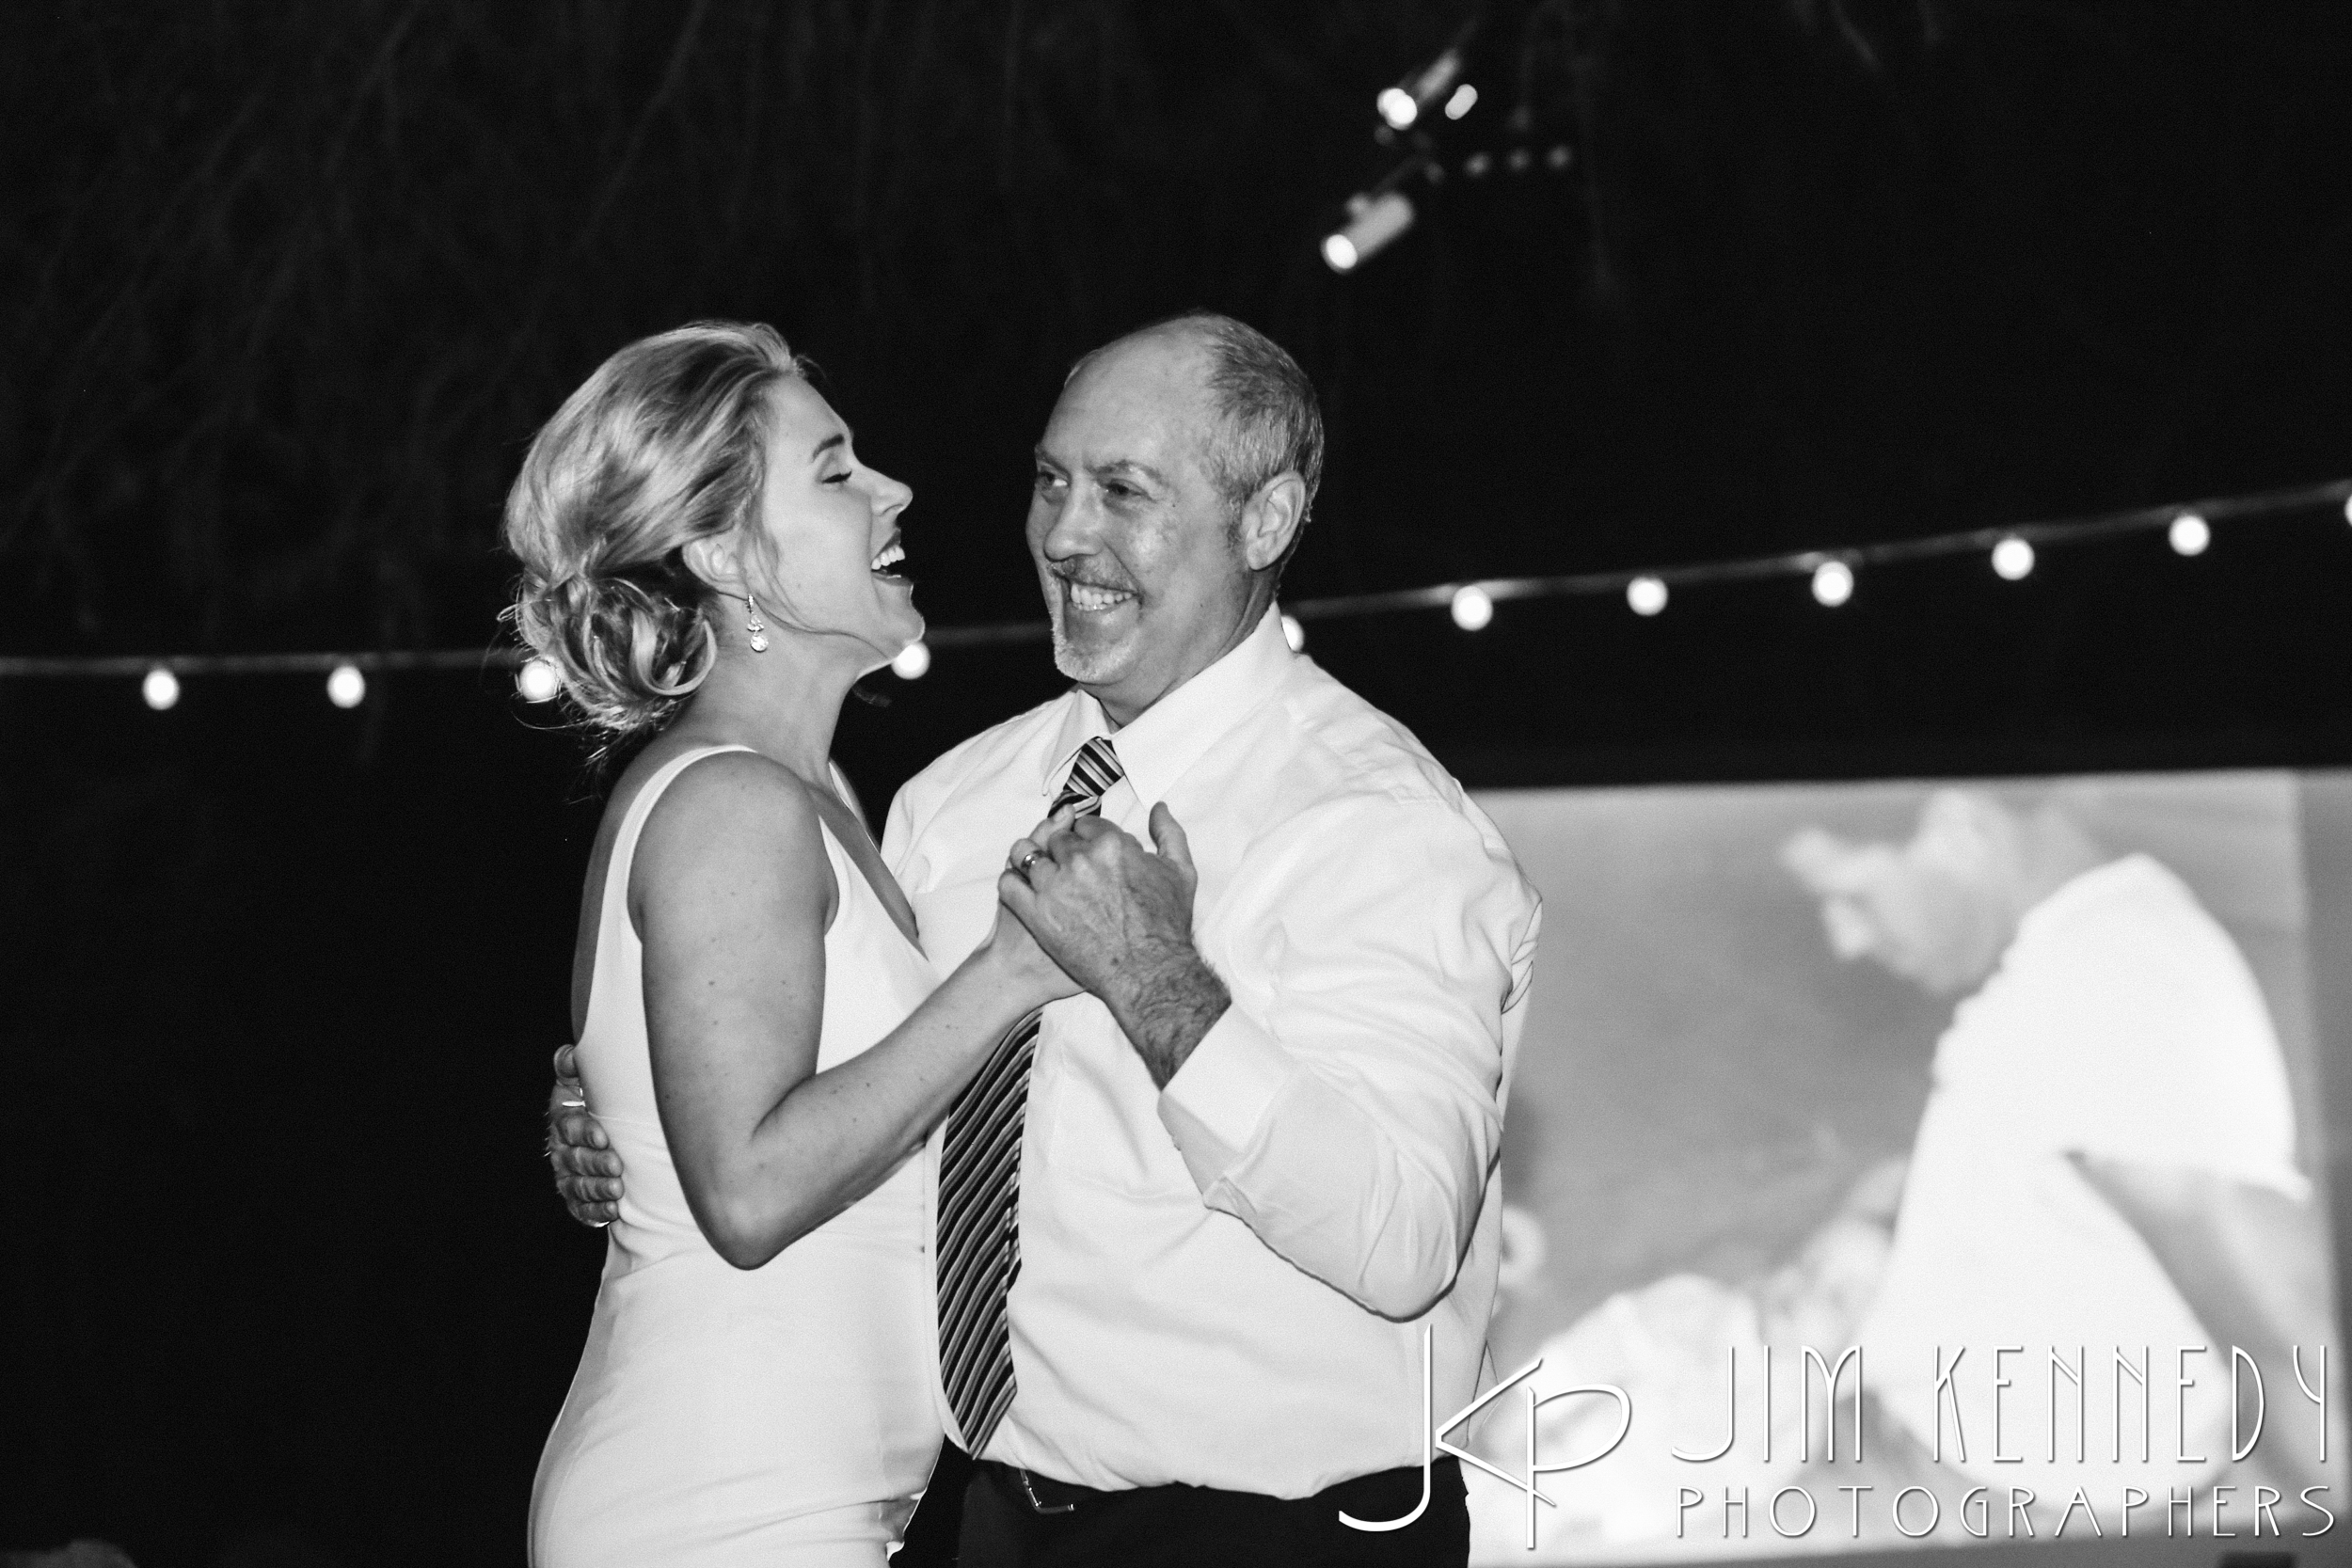 jim_kennedy_photographers_highland_springs_wedding_caitlyn_0200.jpg